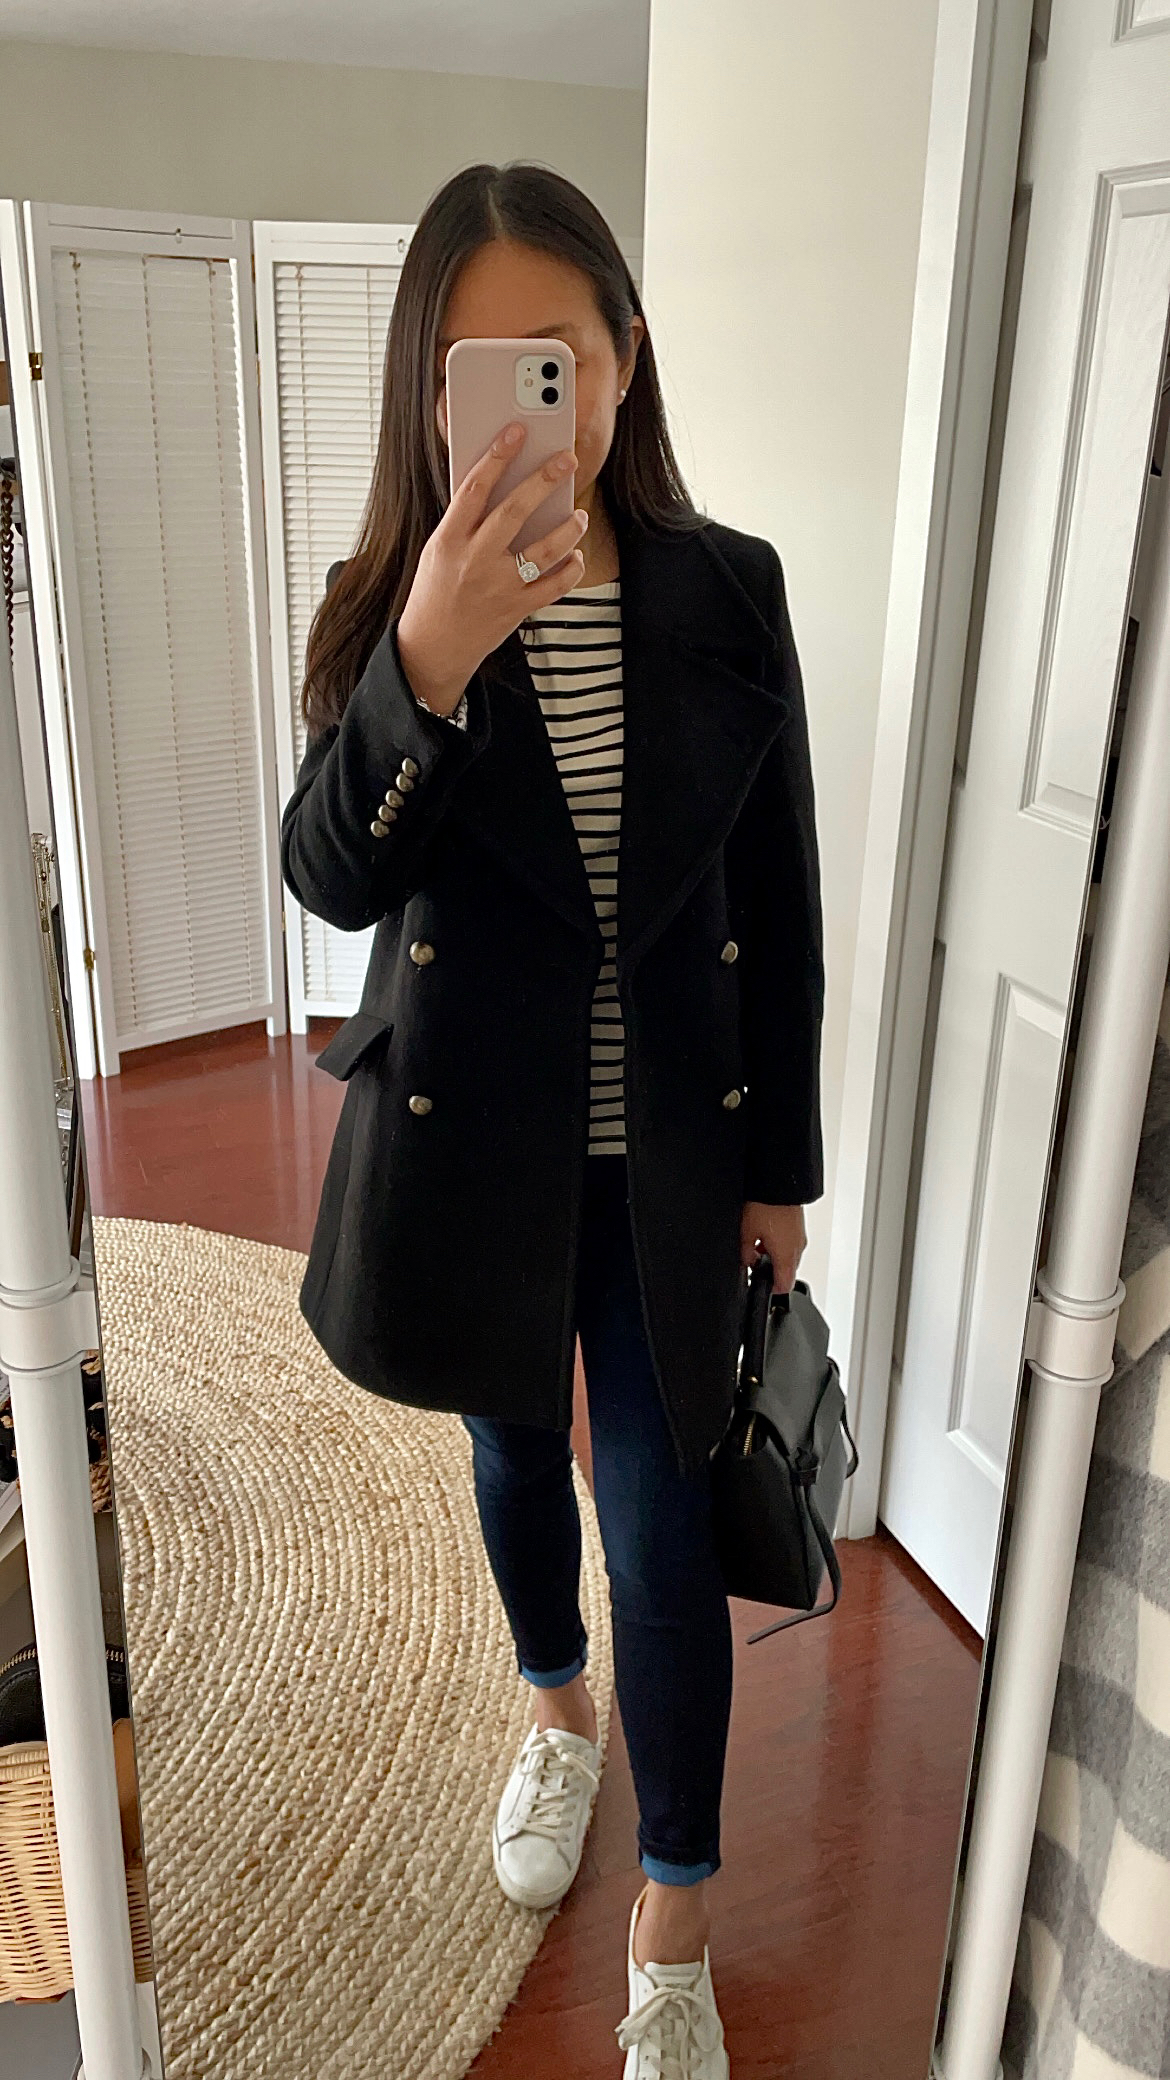 Nili Lotan x Target Women's Double Breasted Coat, size XXS